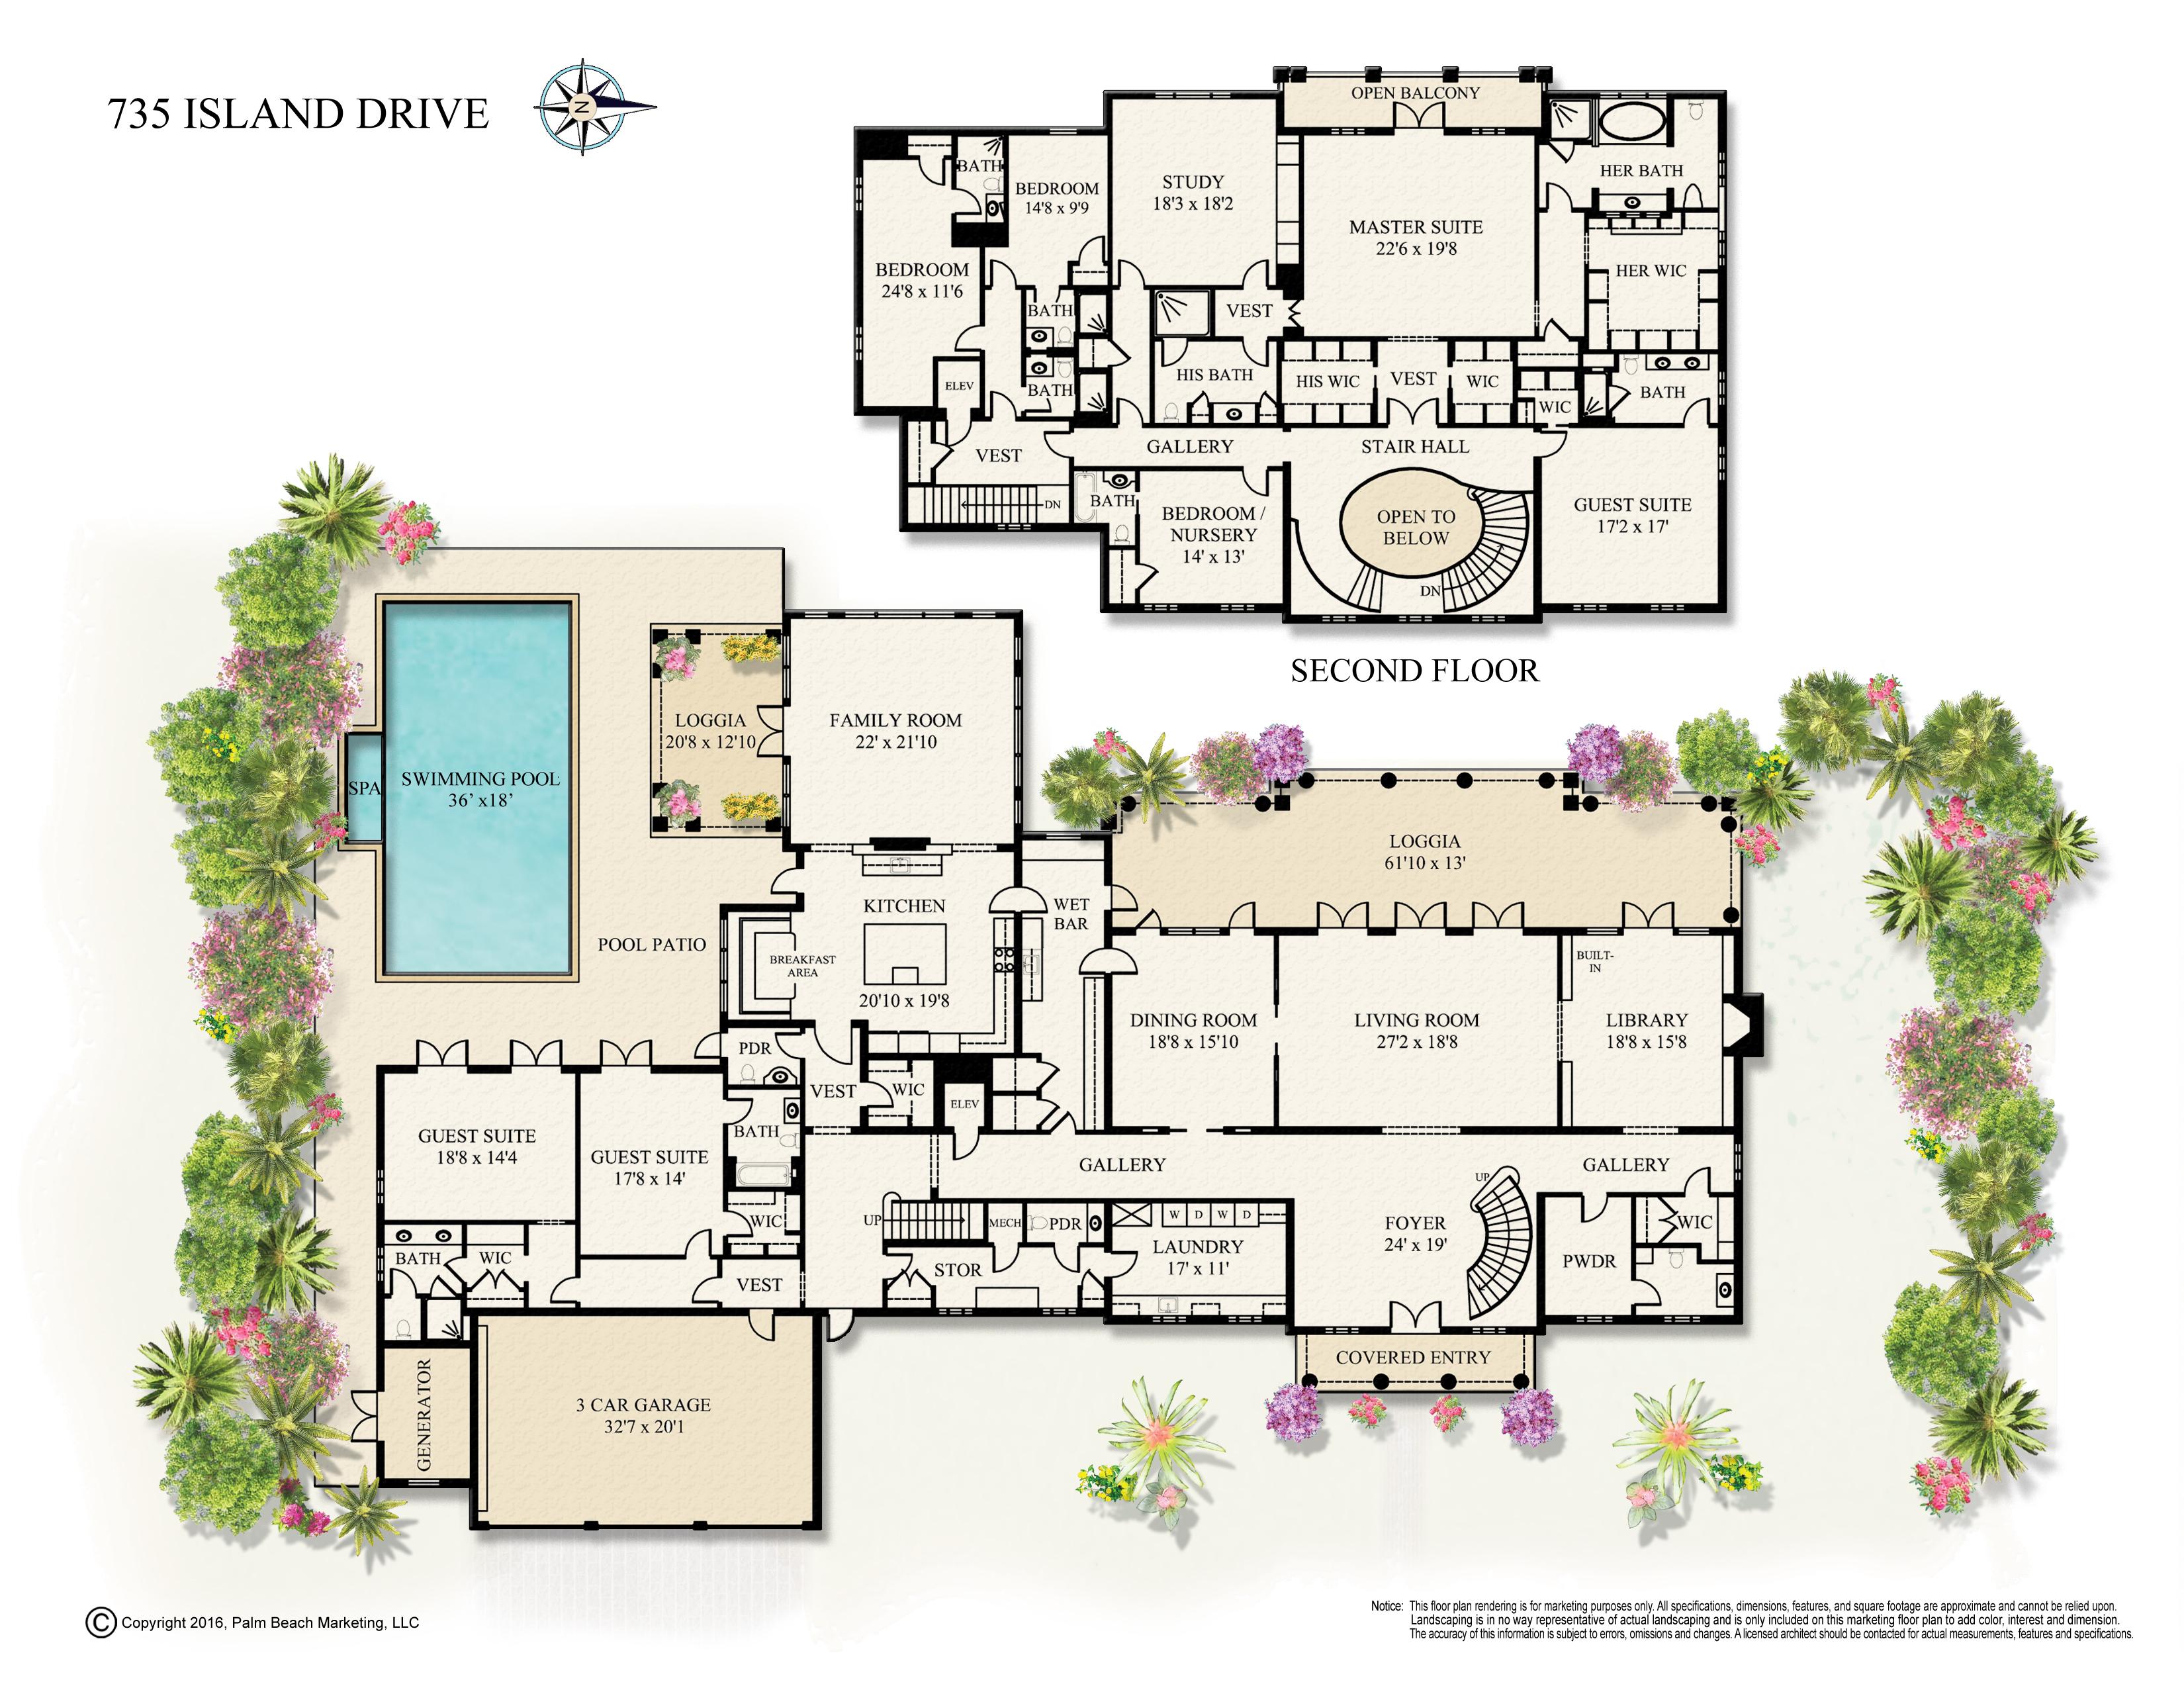 B8B57F15-1856-4A29-68B1-C9A91A40DB14 Palm Garden House Plan on conservatory plans, tree plans, greenhouse plans, cathedral plans, pagoda plans, park plans, garden plans, pond plans, pavilion plans, wardian case plans,